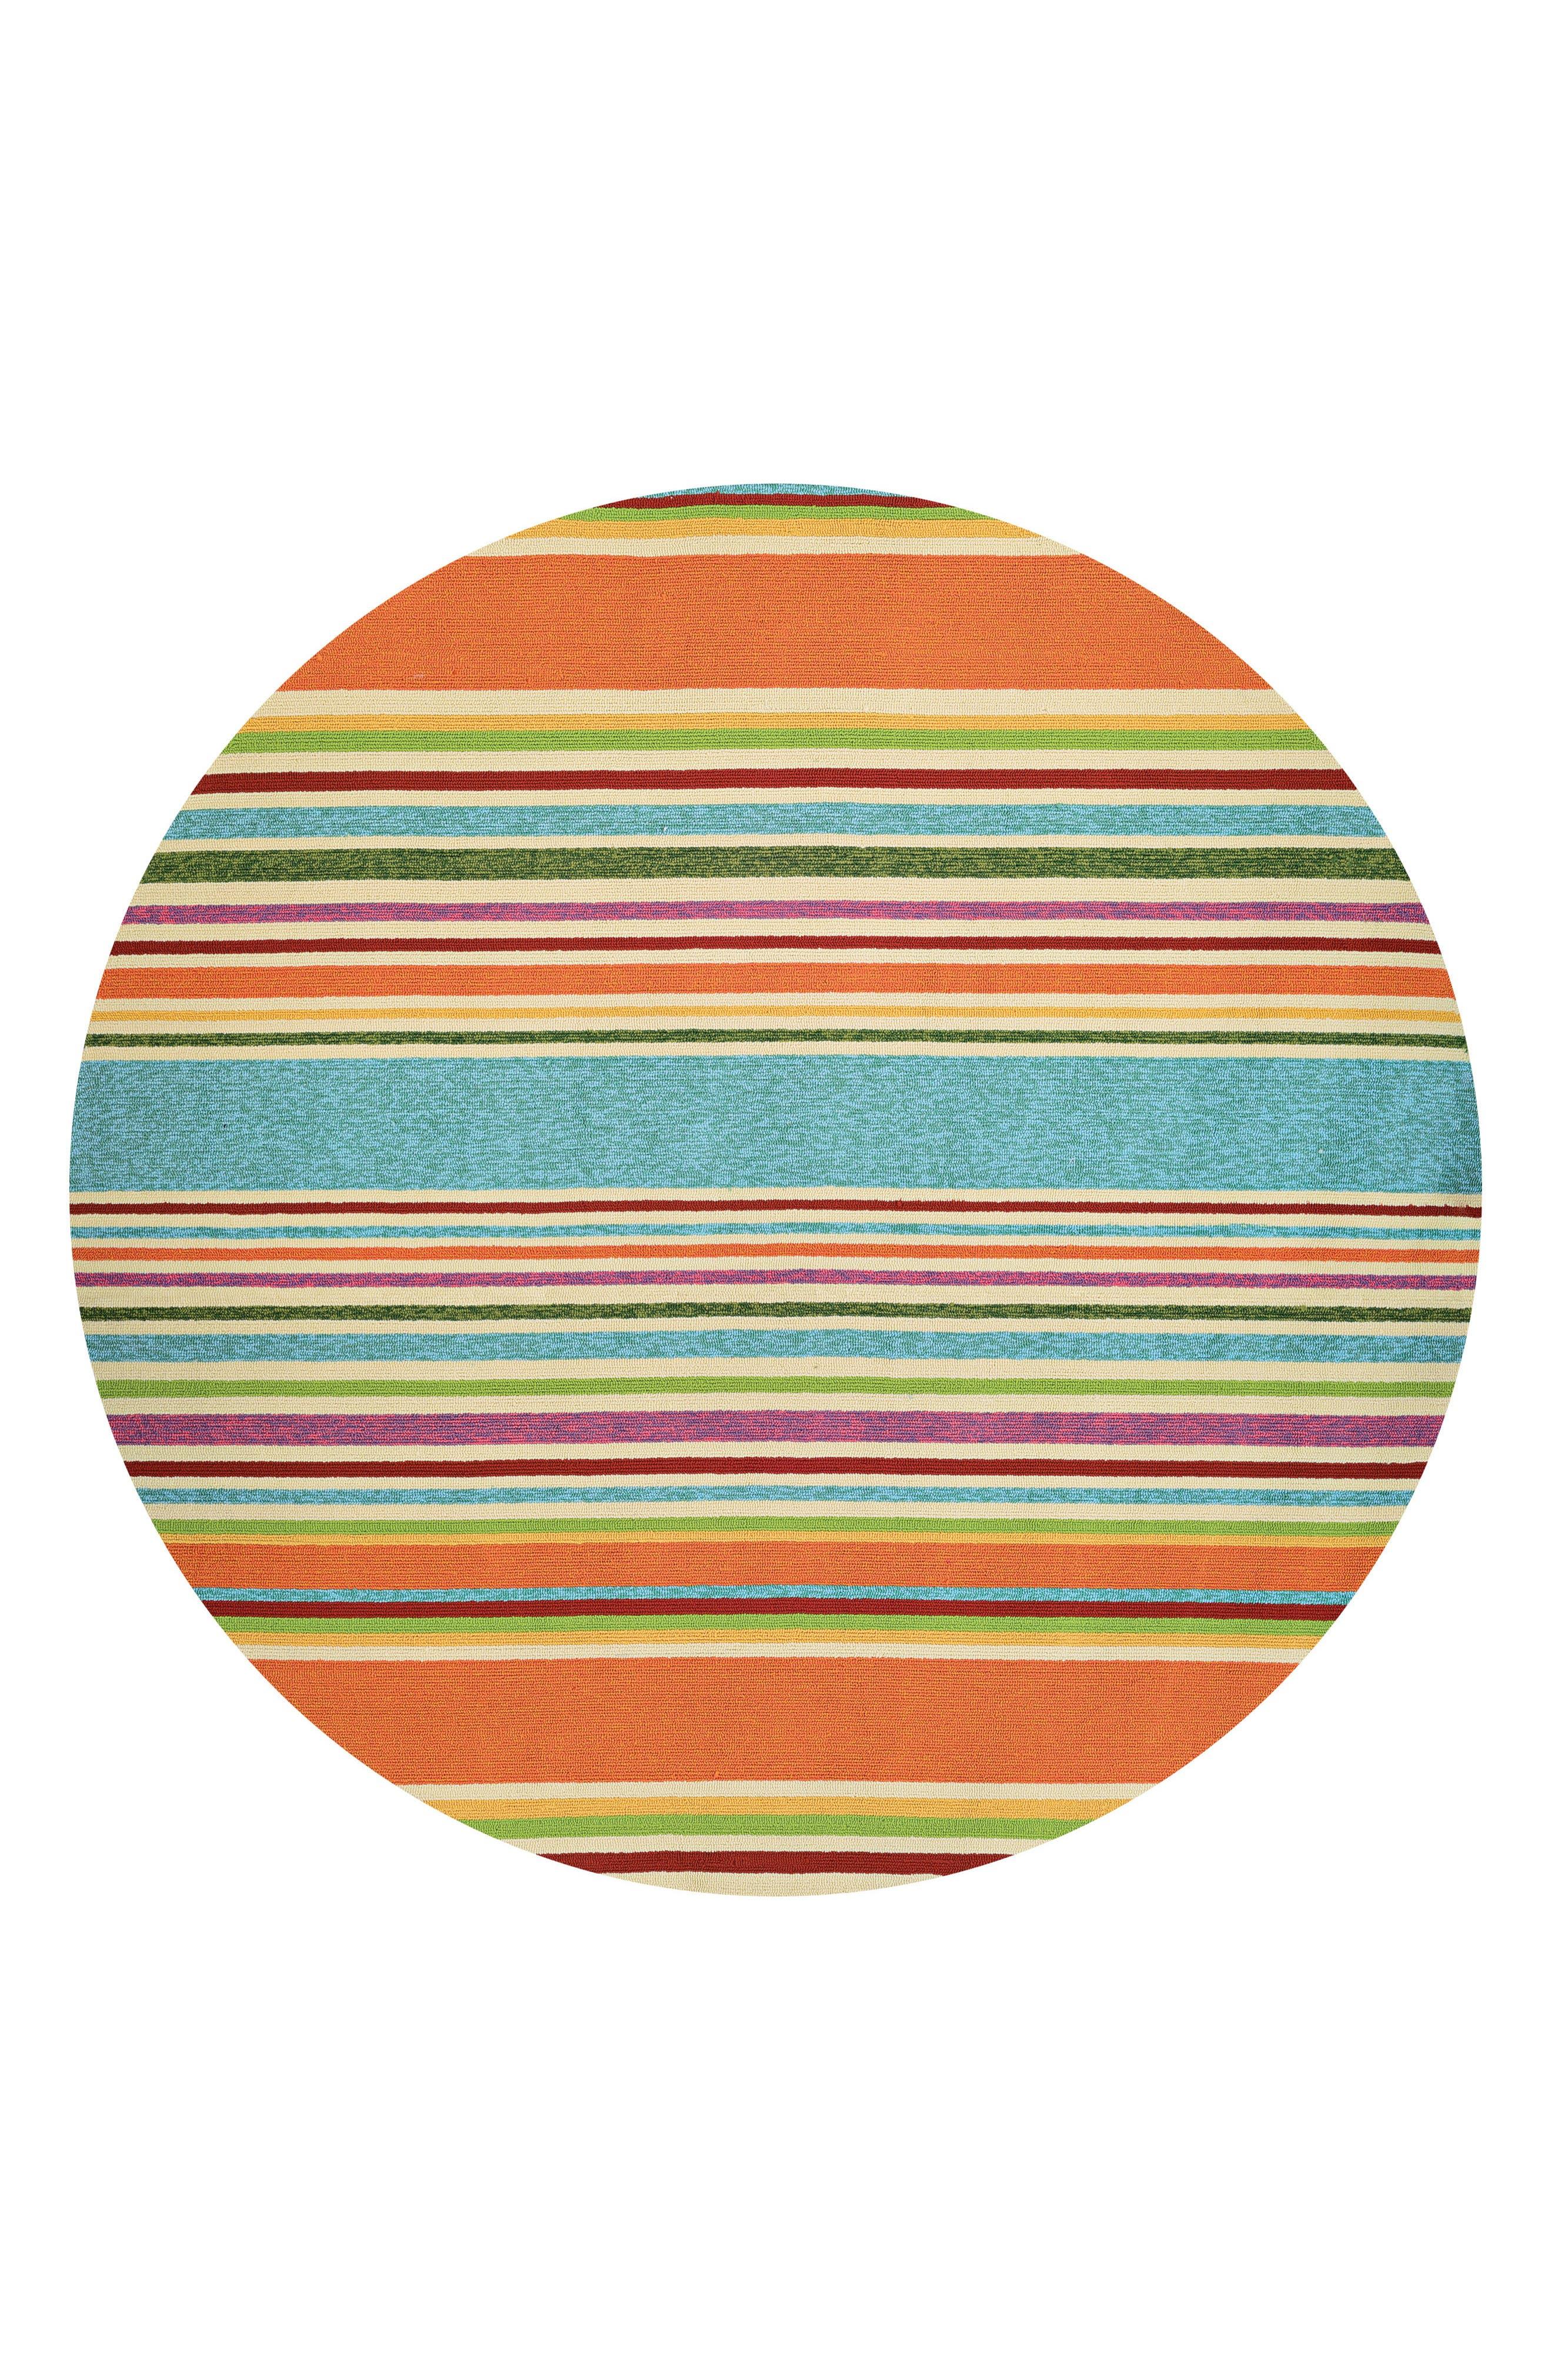 Sherbet Stripe Indoor/Outdoor Rug,                         Main,                         color, Orange/ Multi